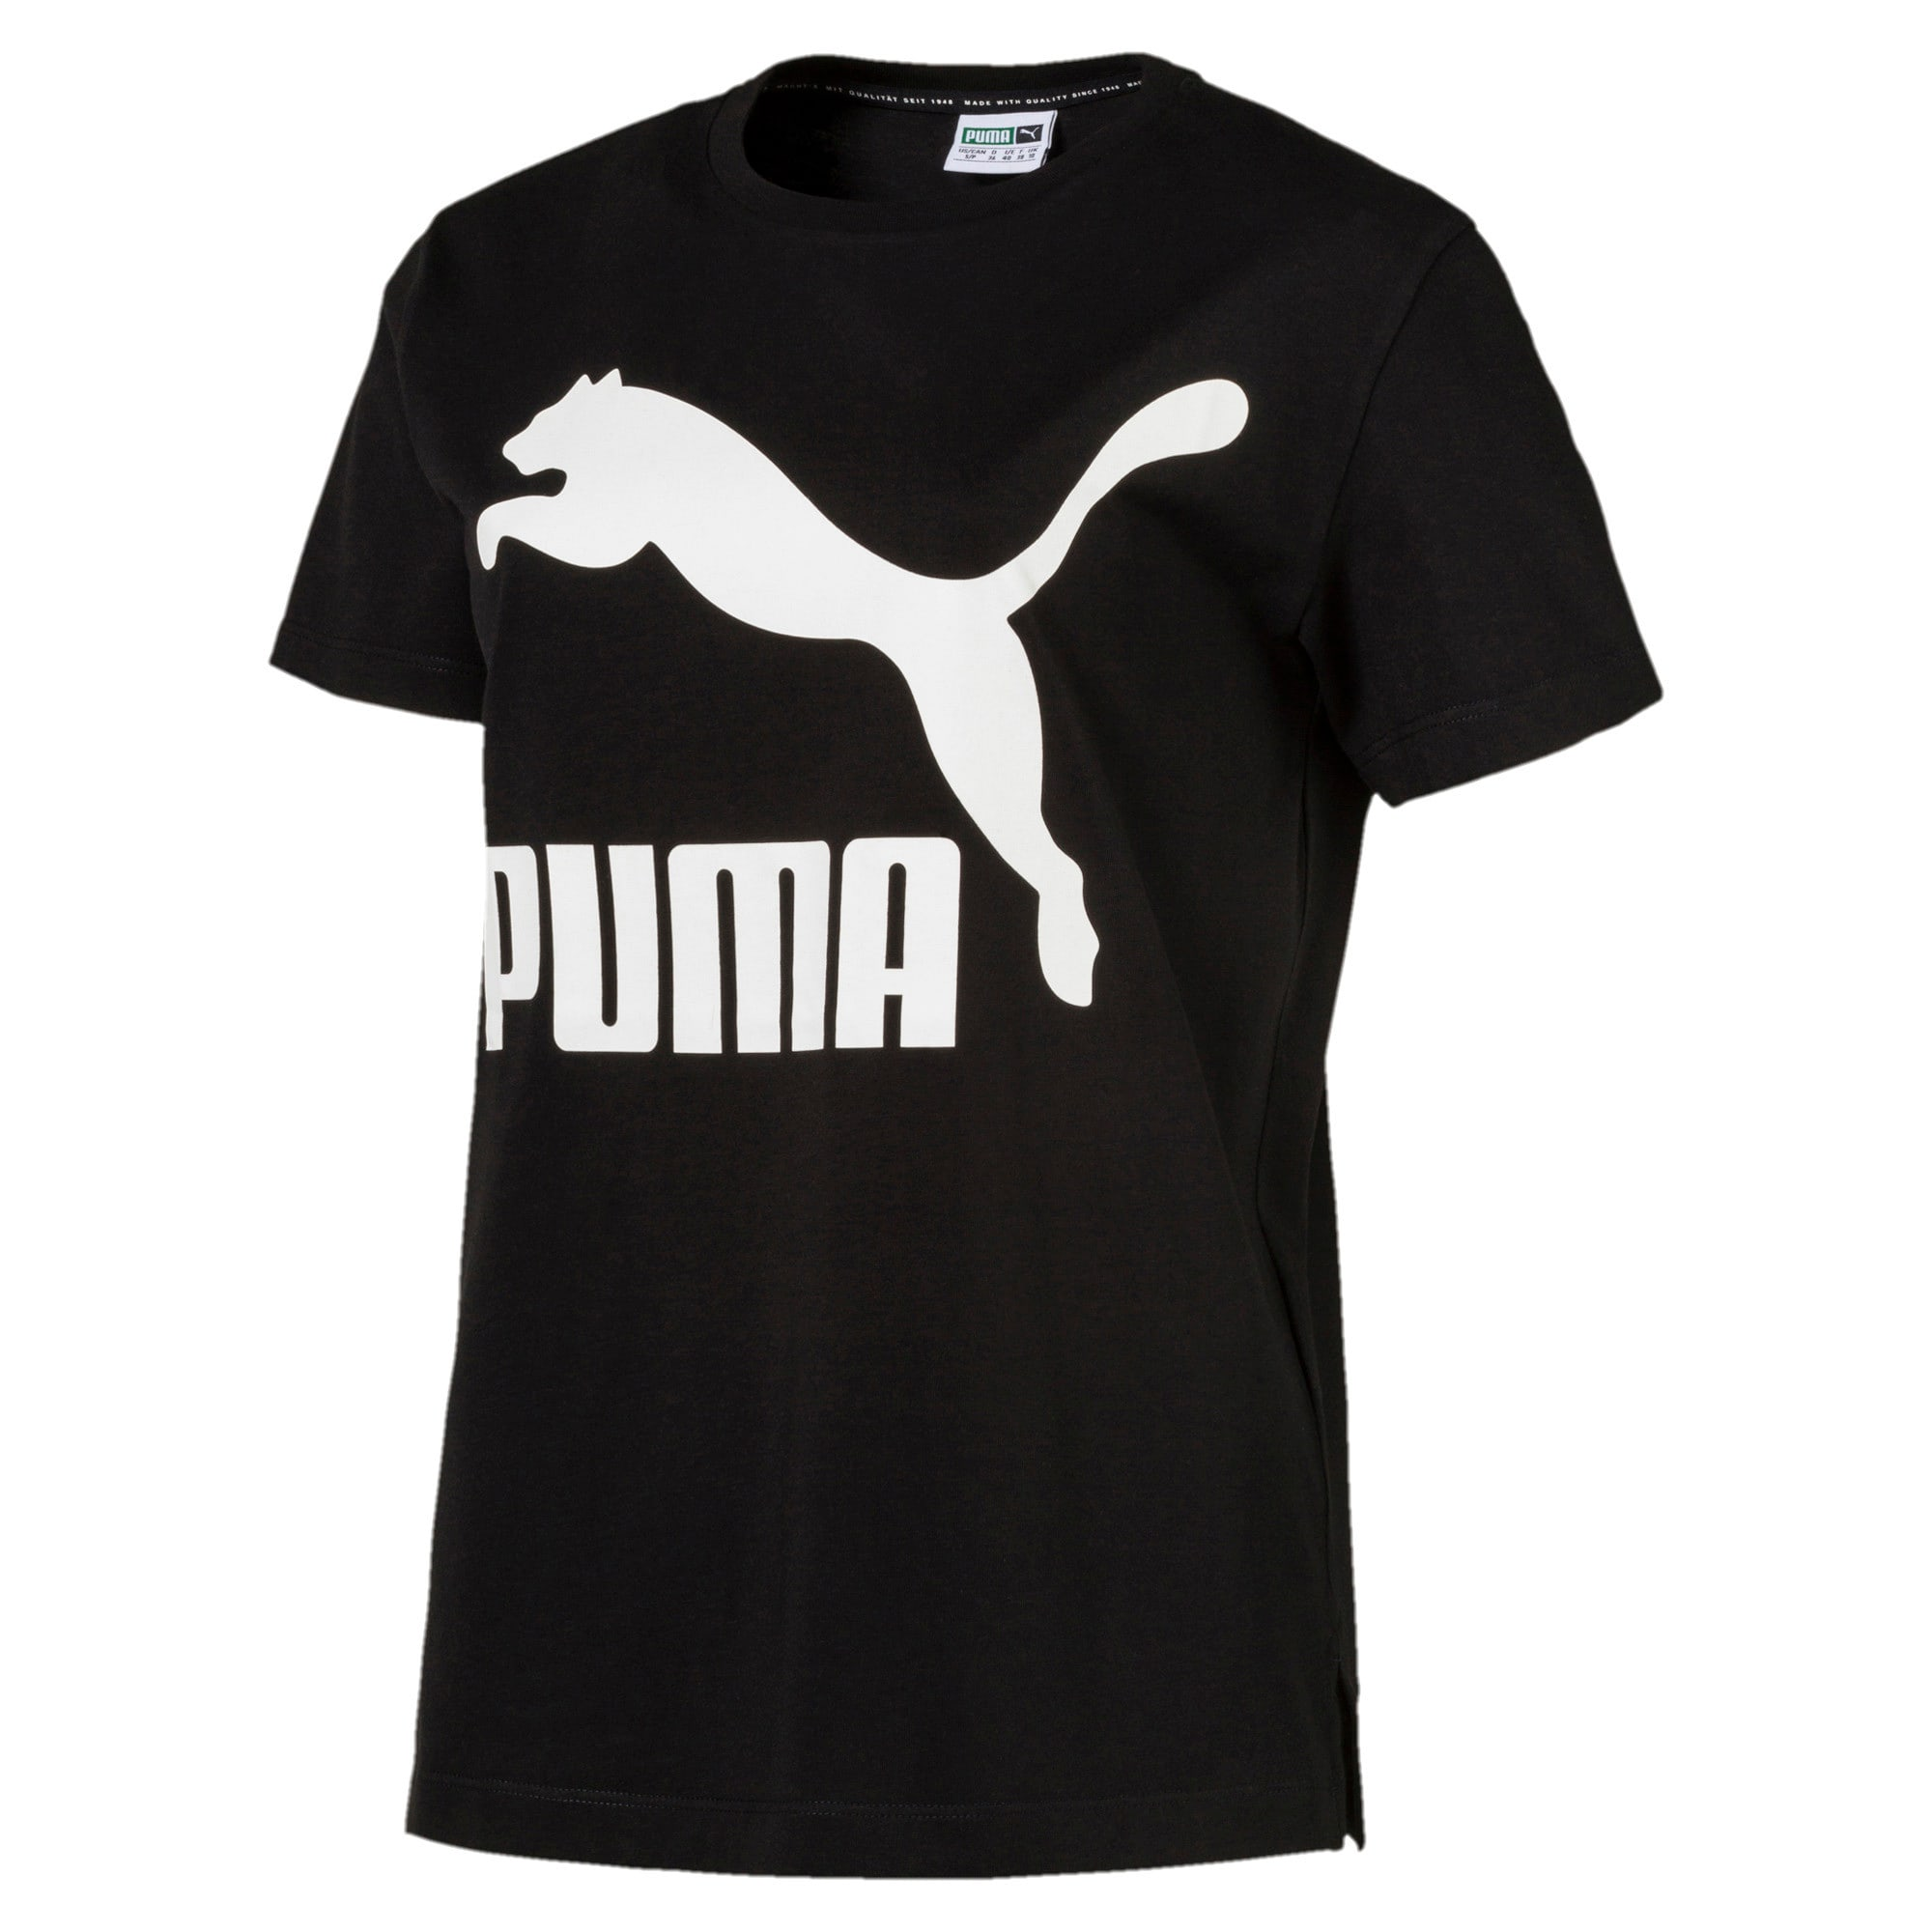 Thumbnail 1 of Classics Logo Women's T-Shirt, Cotton Black, medium